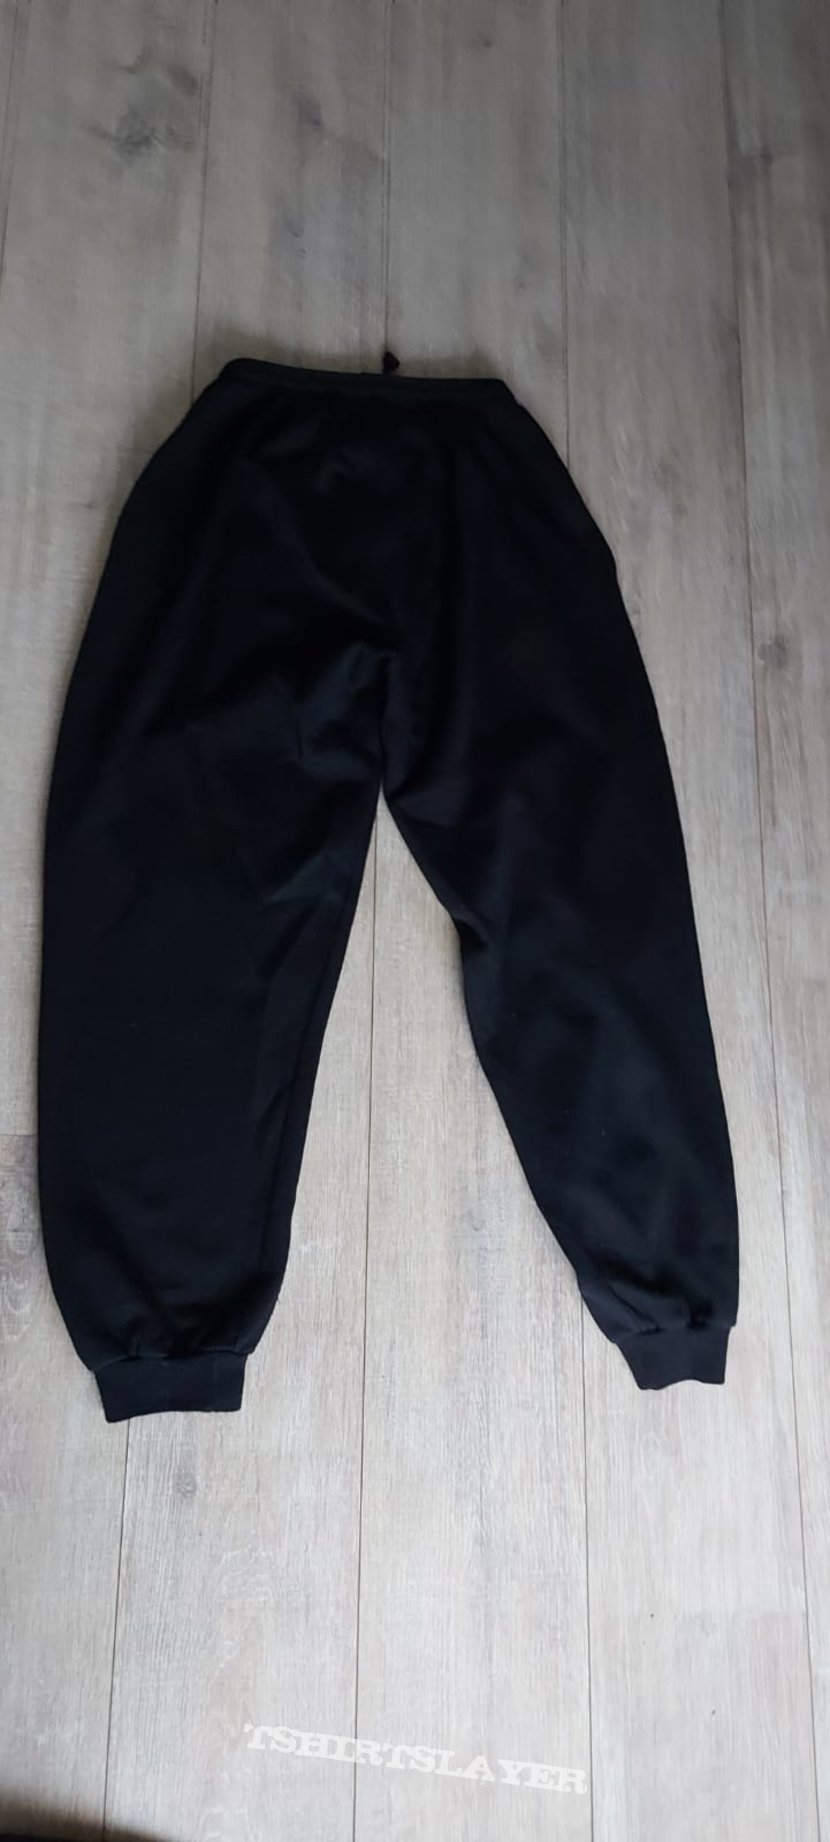 1990s Cancer Sweatpants